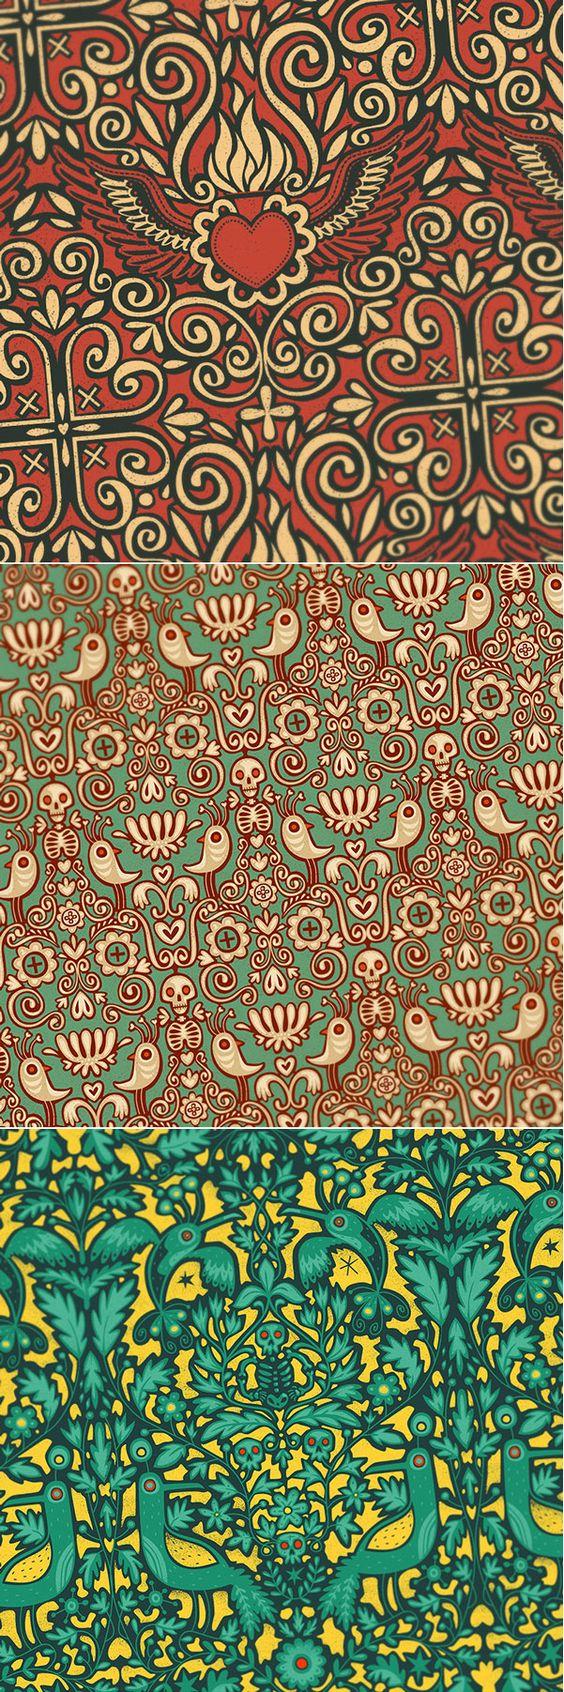 Patterns by Steve Simpson  - https://www.behance.net/gallery/22675177/Patterns-Collection